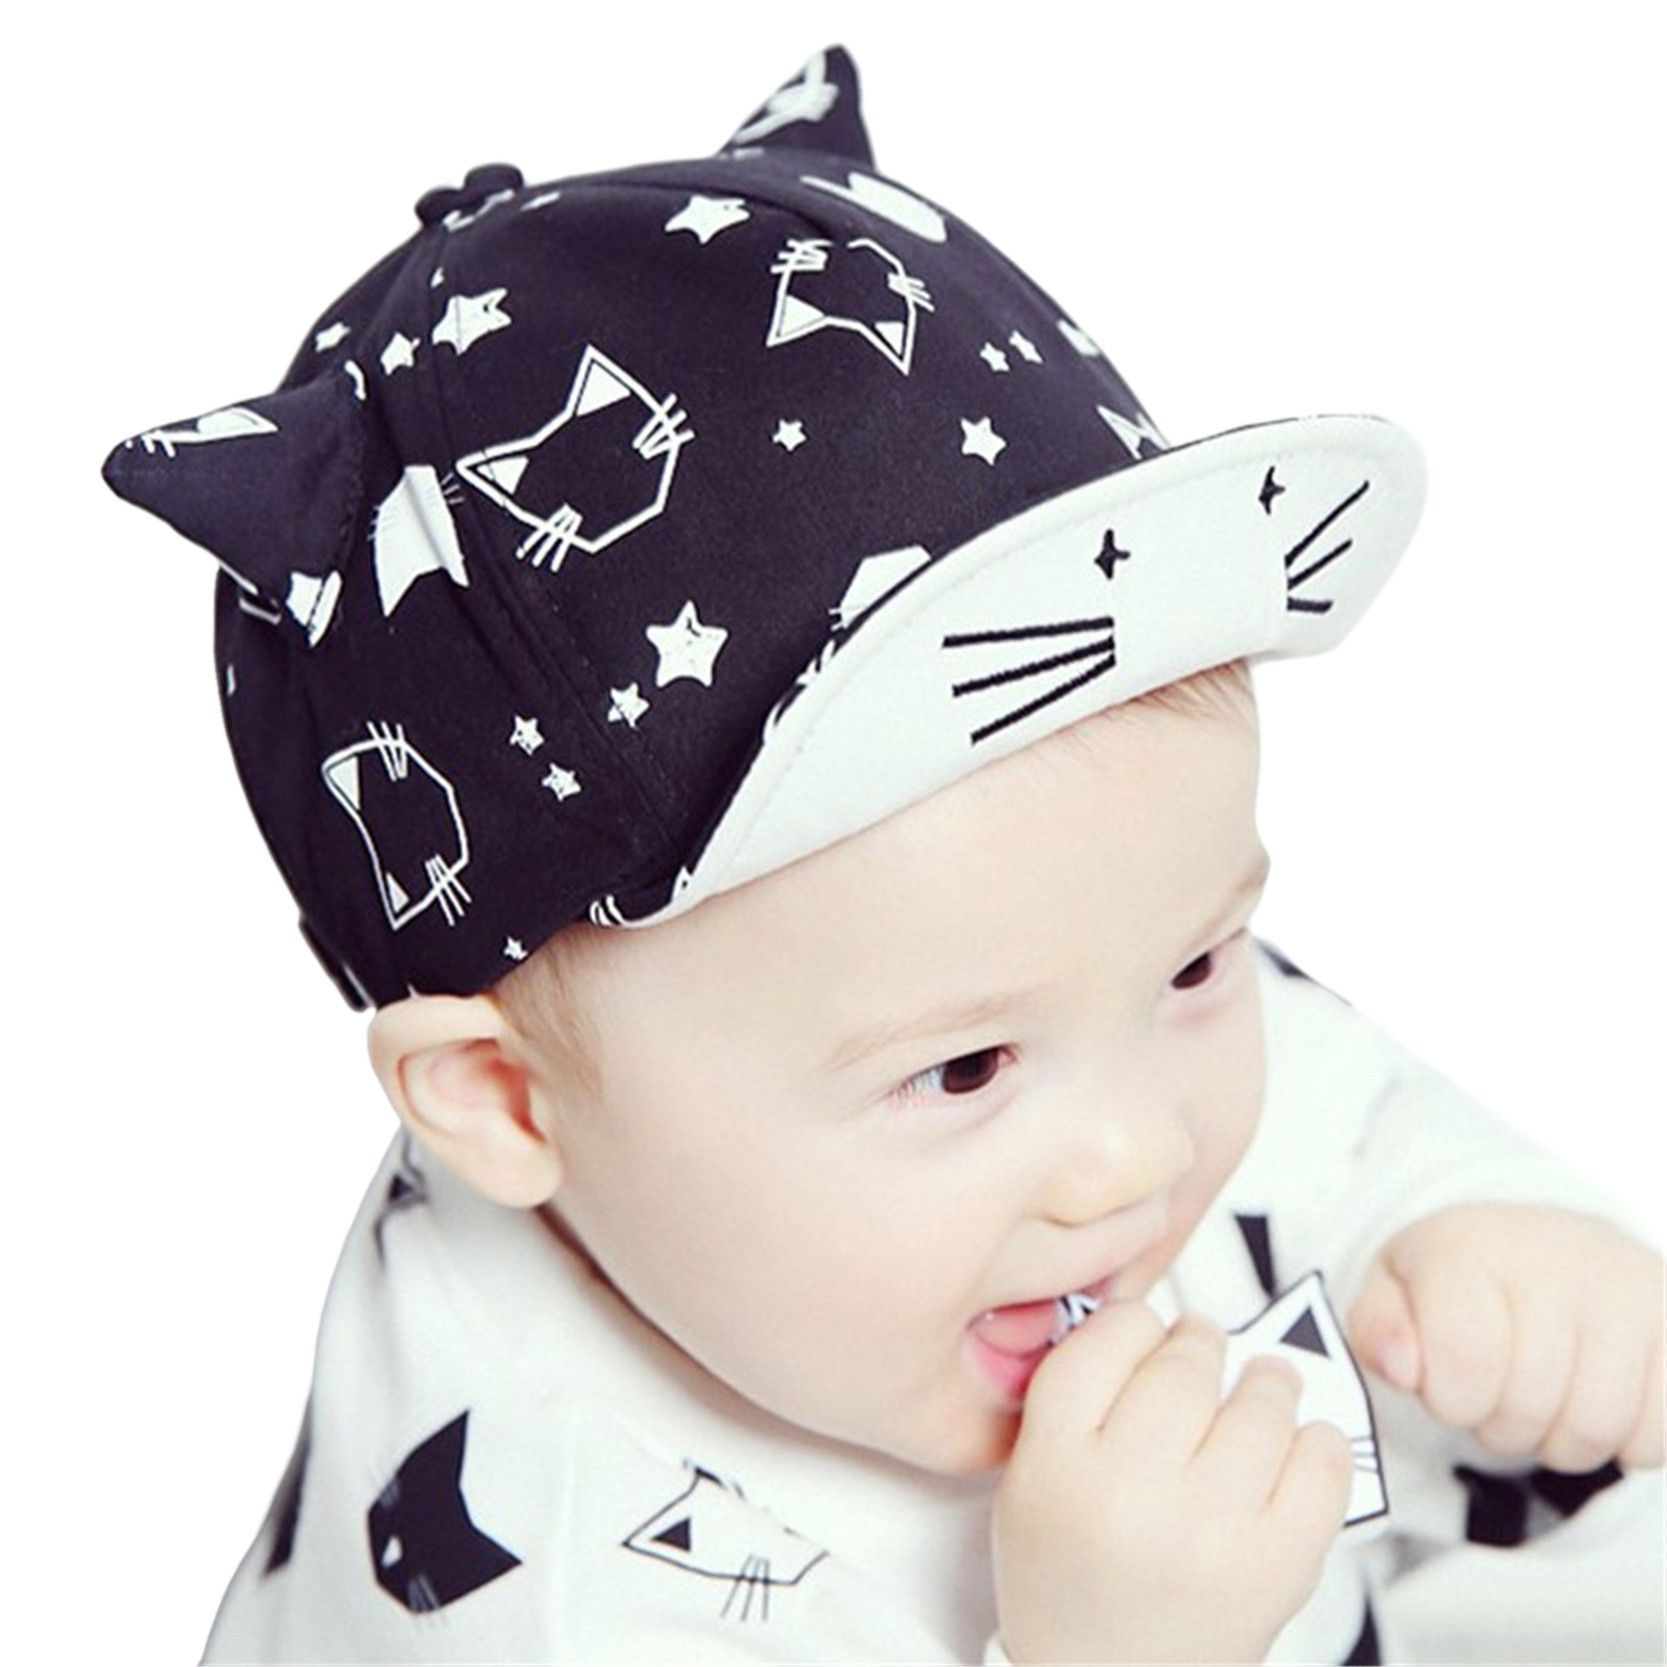 49b653e5d447 Baby Baseball Cap Cute Print Cat Sun Hat With Ears For Boy Girl ...